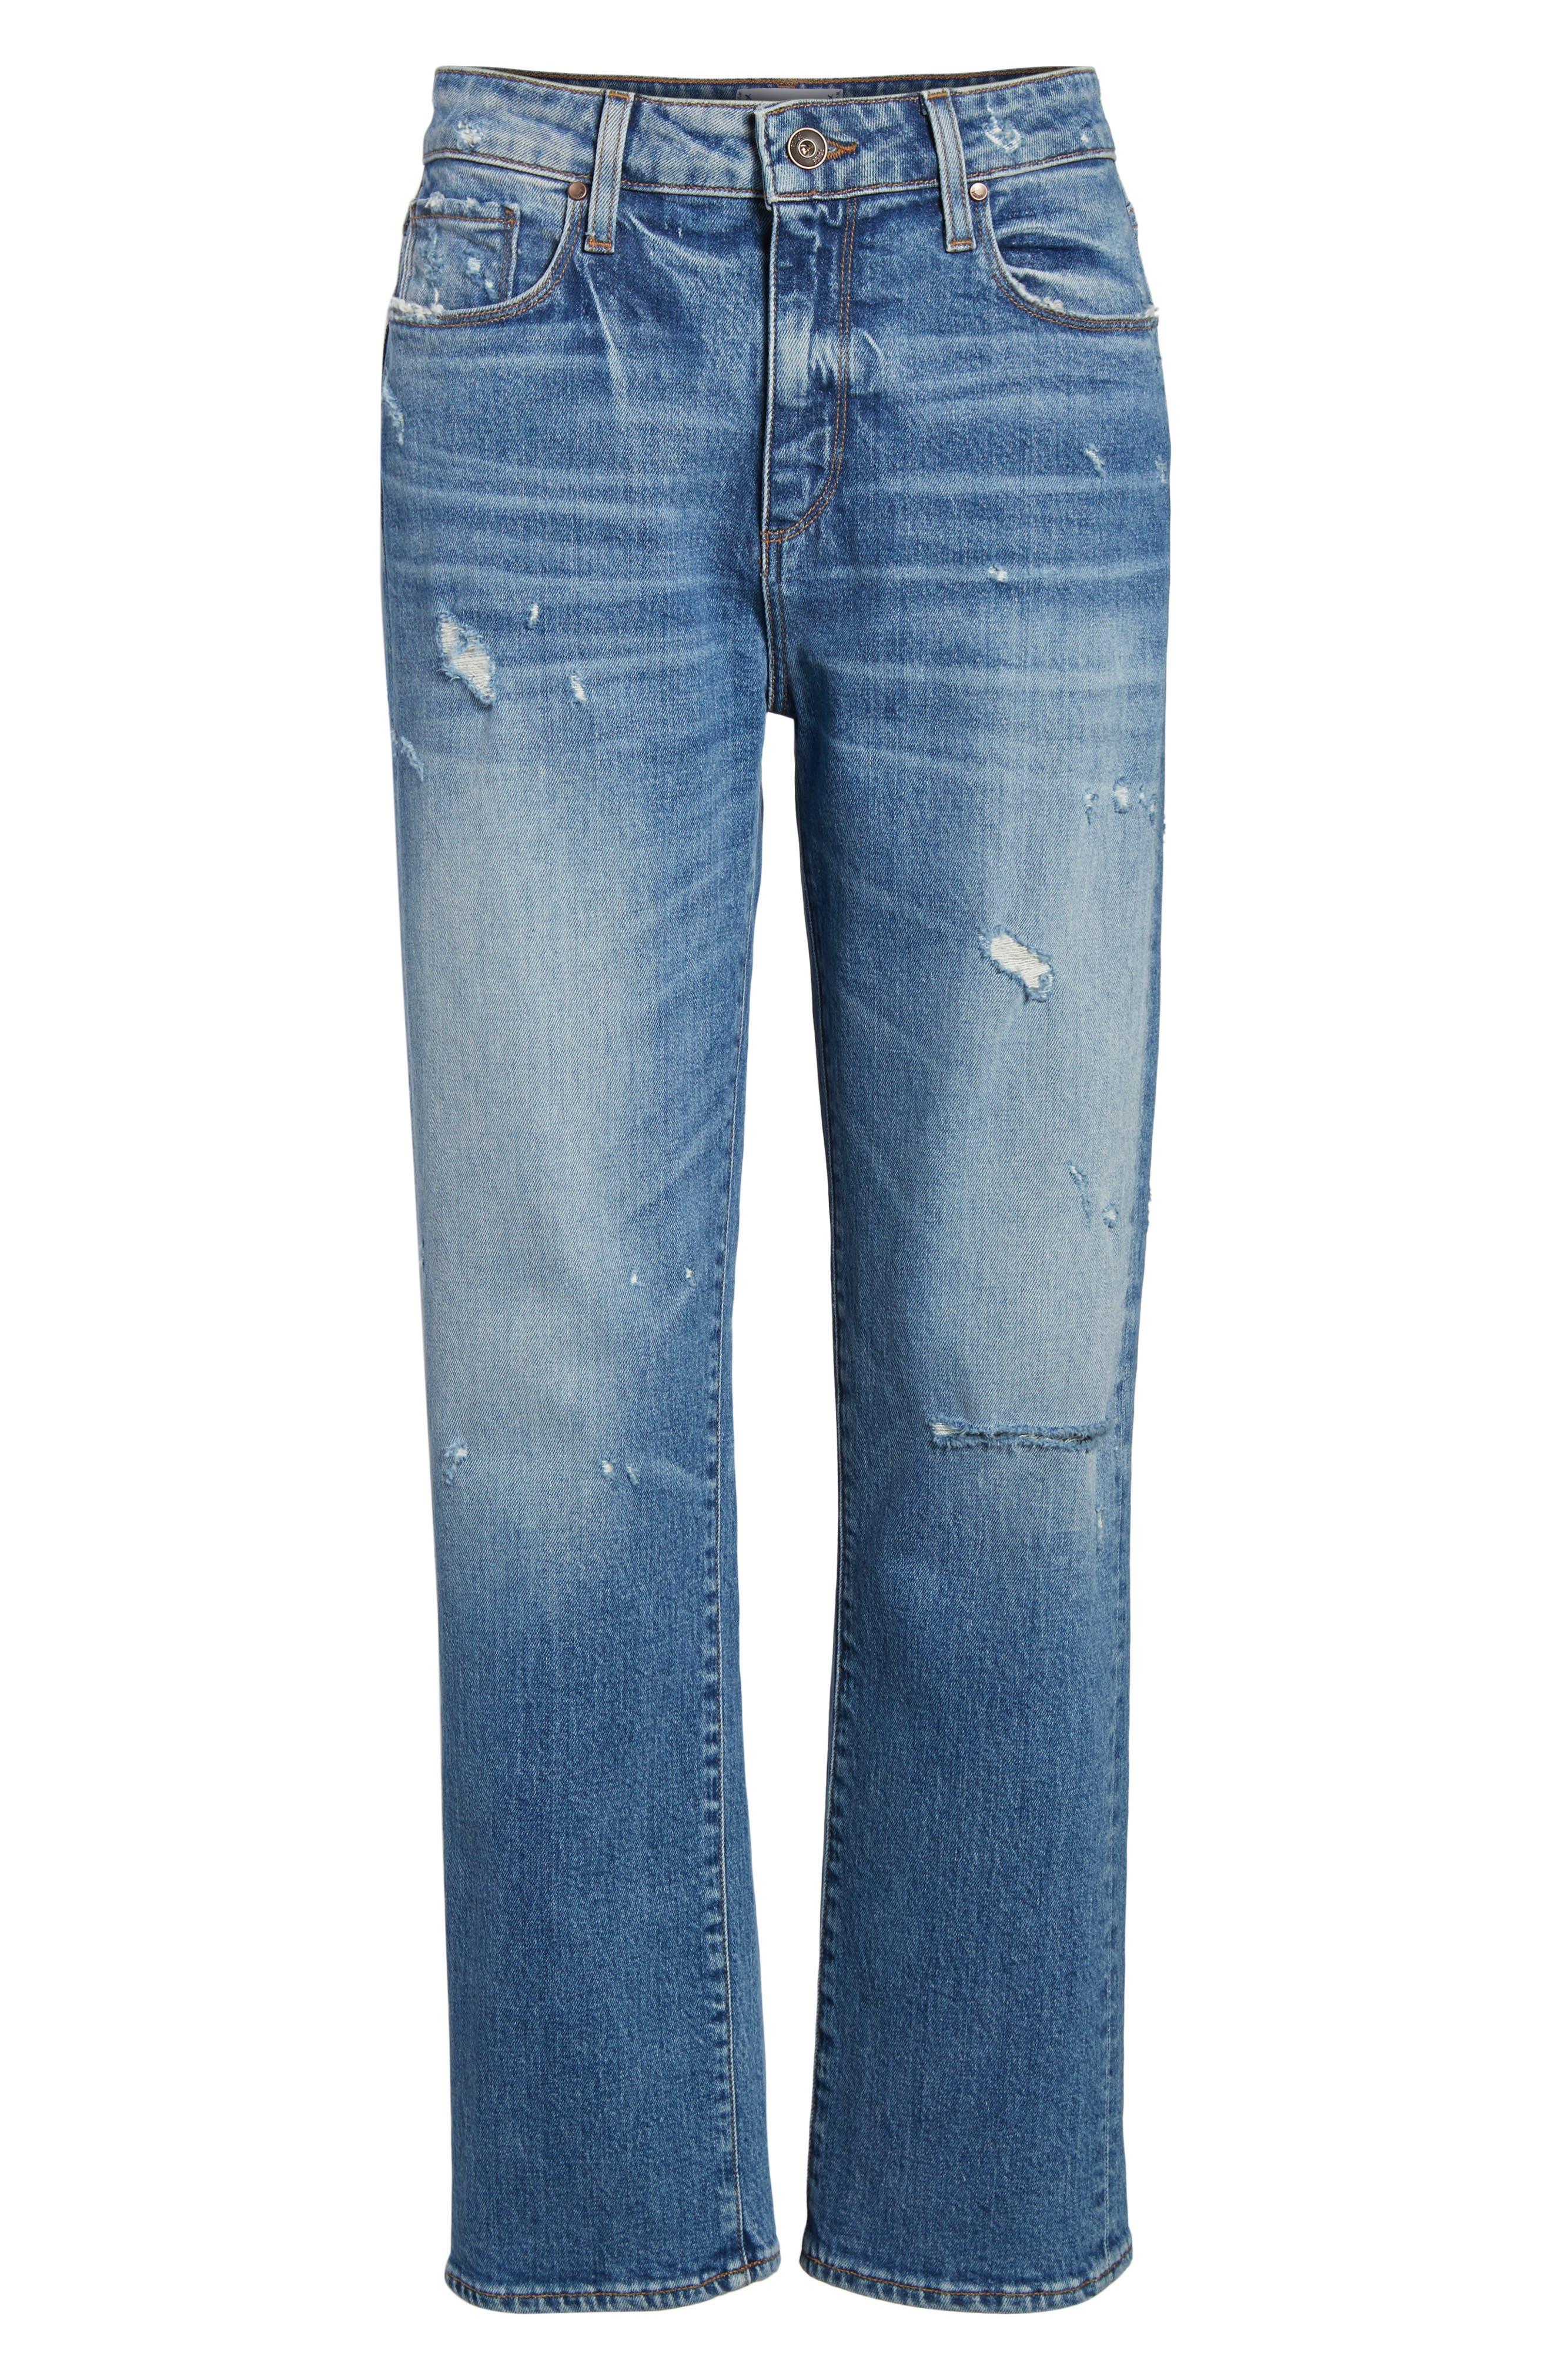 Transcend Vintage - Noella Straight Leg Jeans,                             Alternate thumbnail 8, color,                             Iola